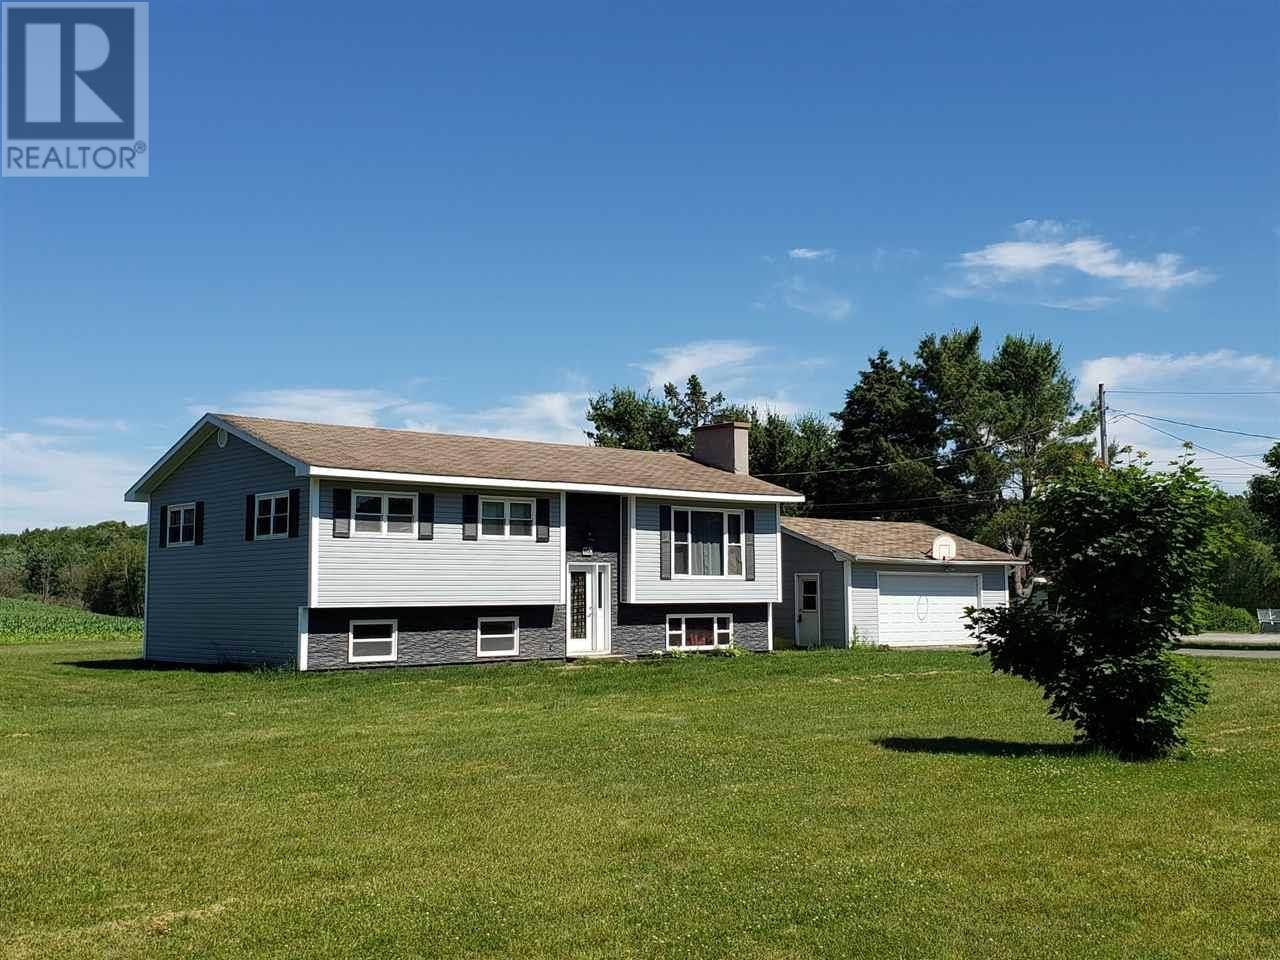 House for sale at 460 Windermere Rd Windermere Nova Scotia - MLS: 201916683